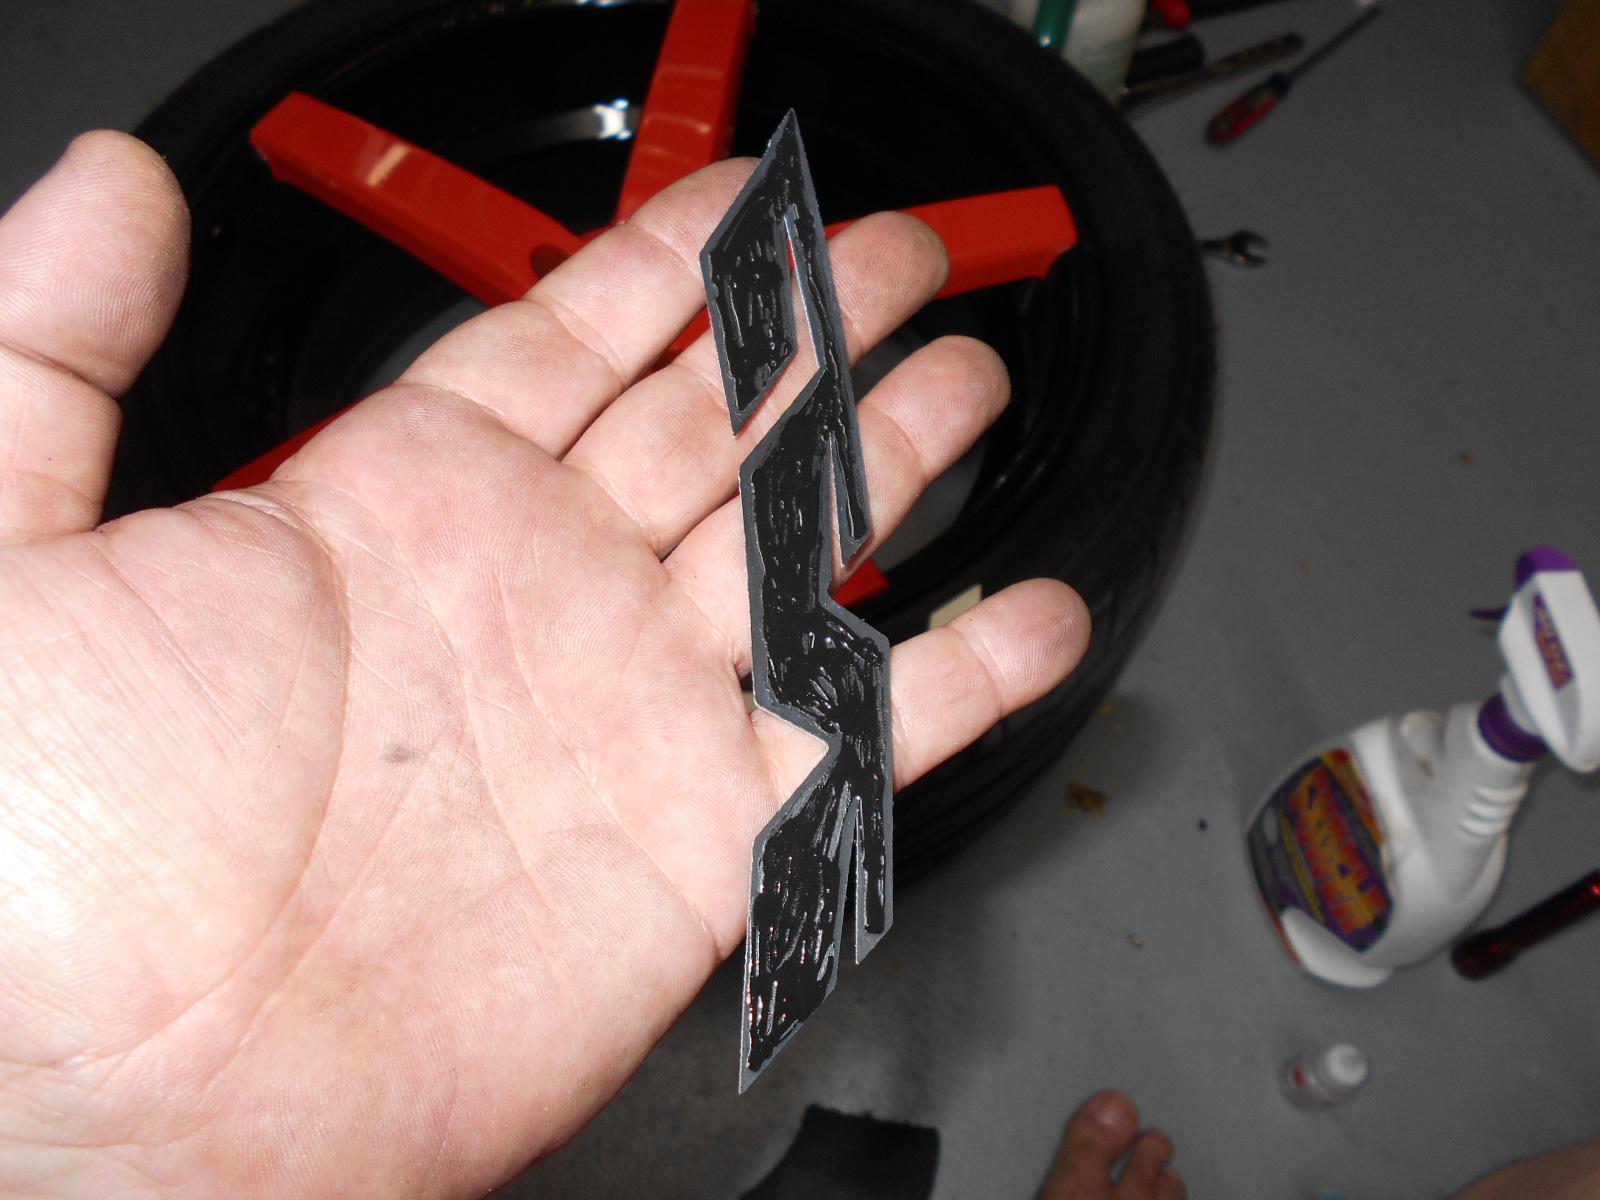 applying adhesive to back of Treadwear graphics